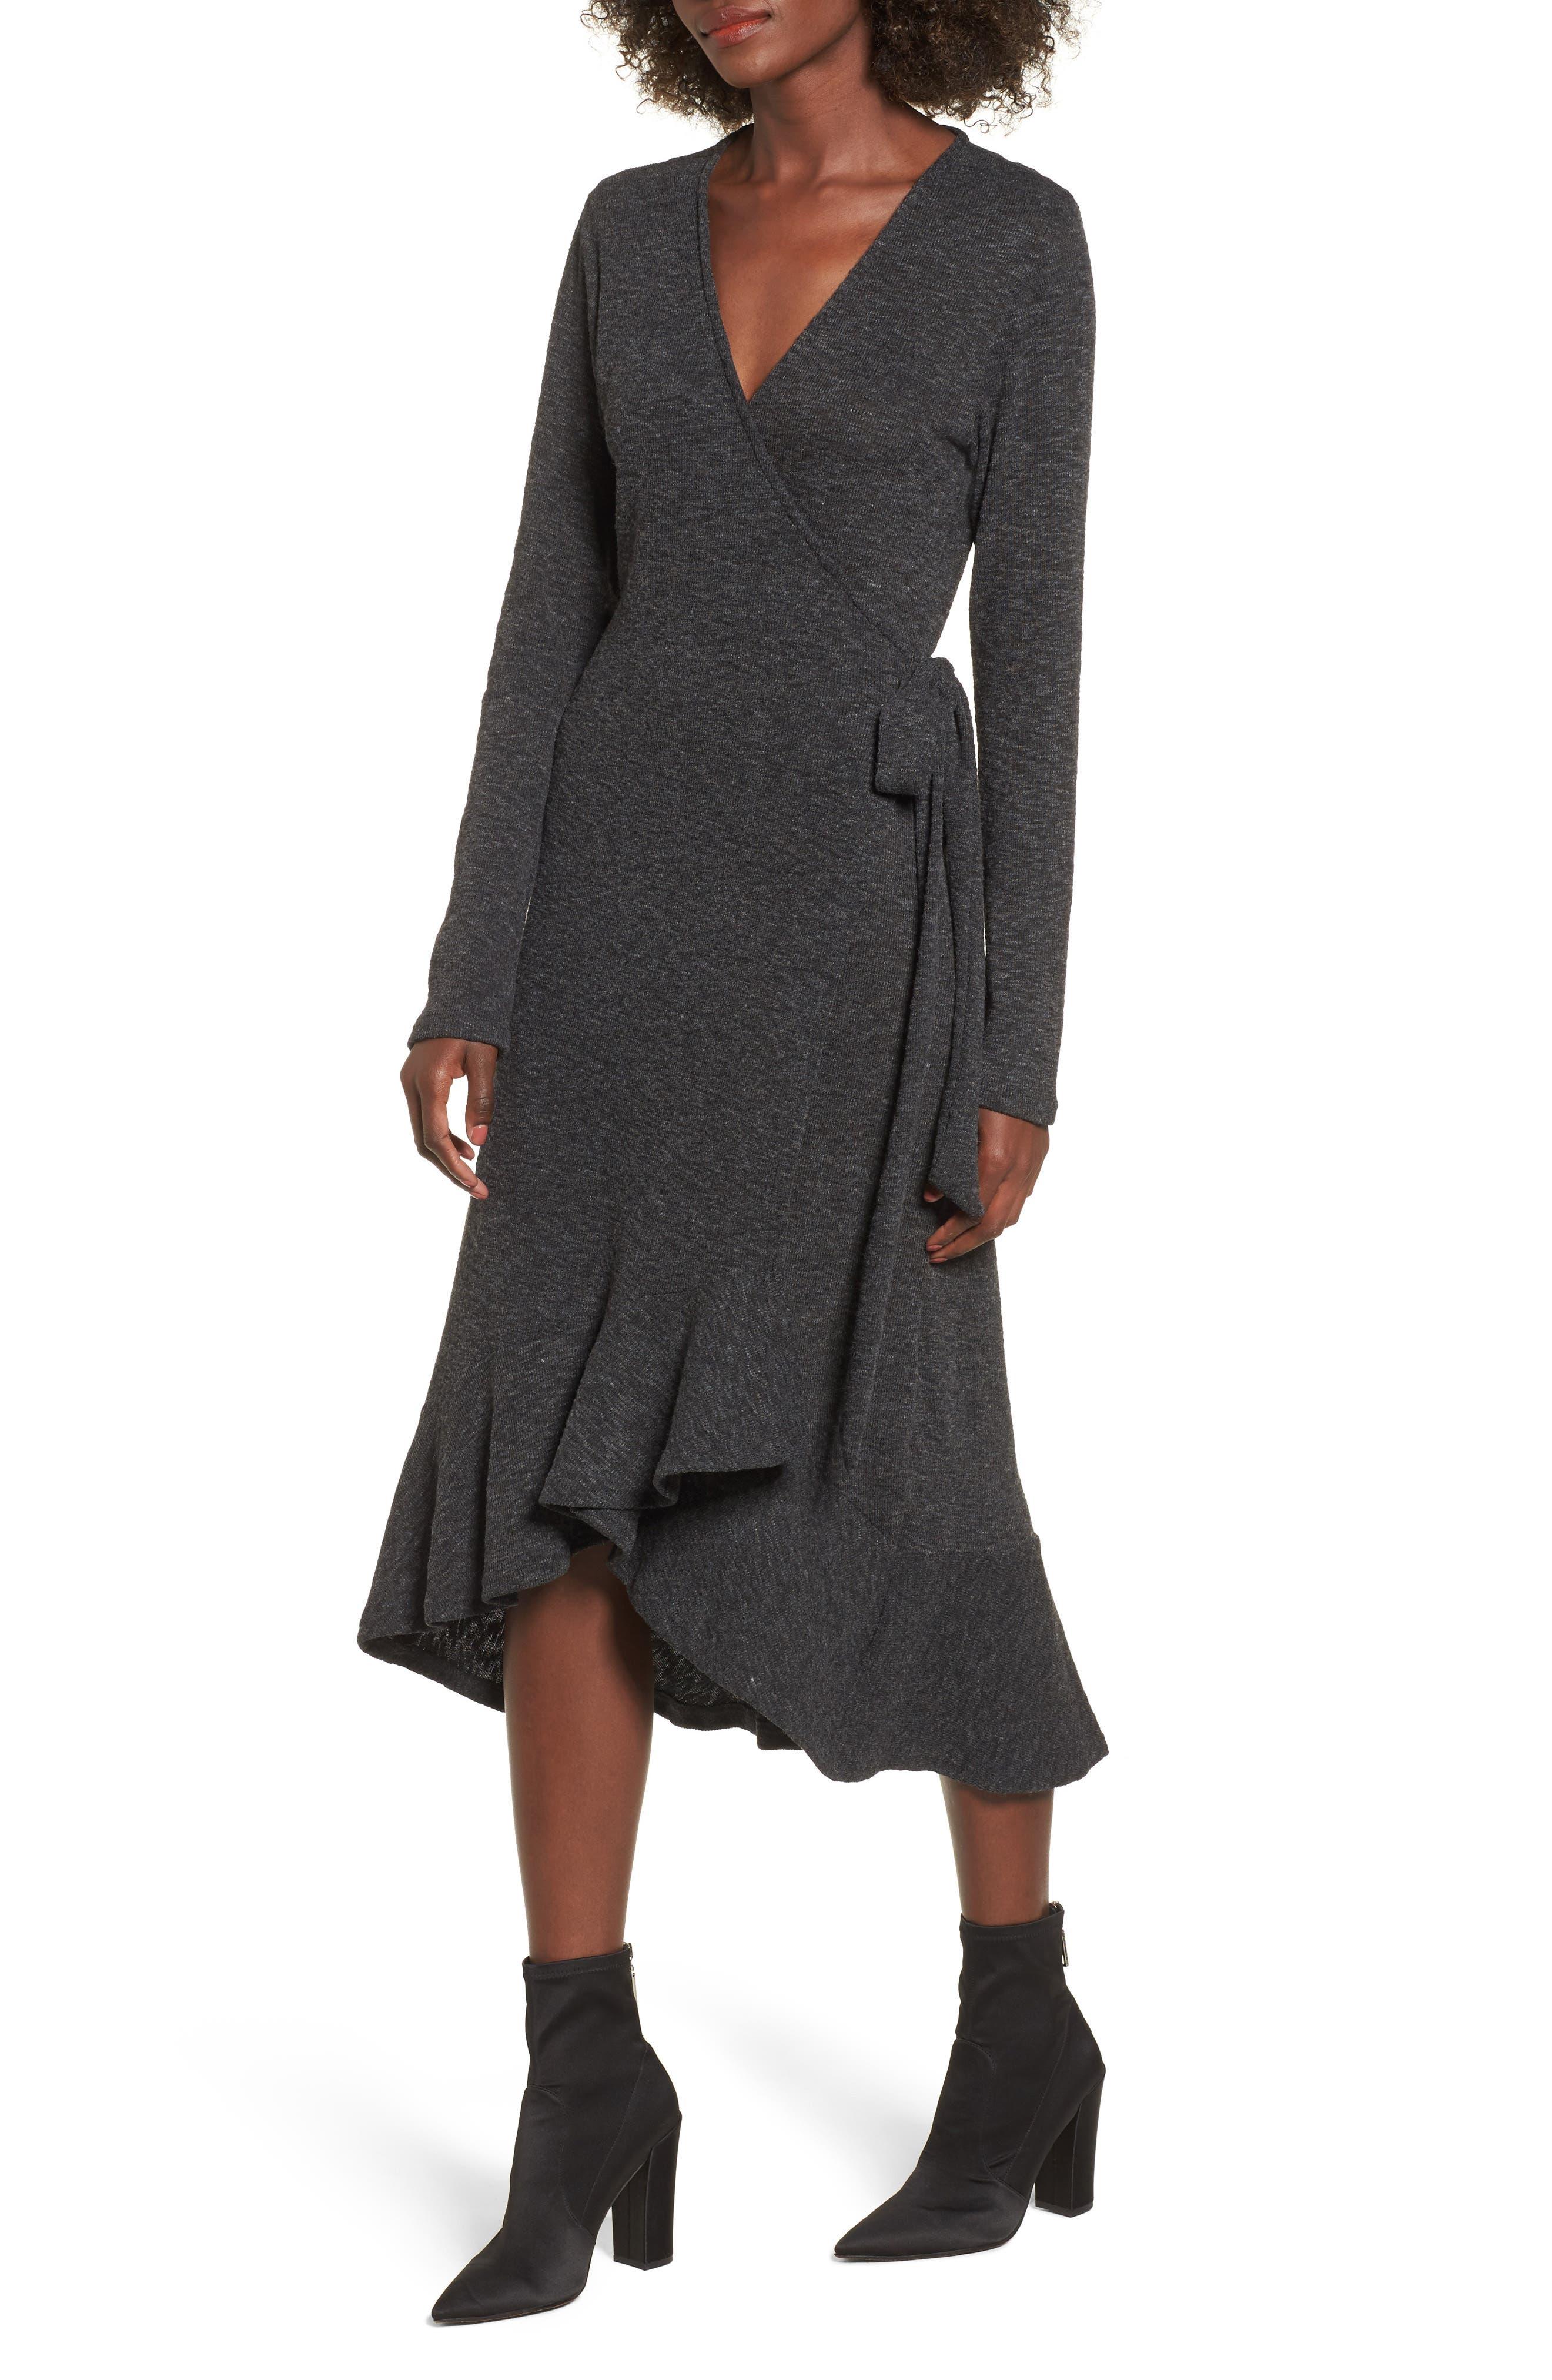 Winter Wandering Wrap Dress,                             Main thumbnail 1, color,                             020